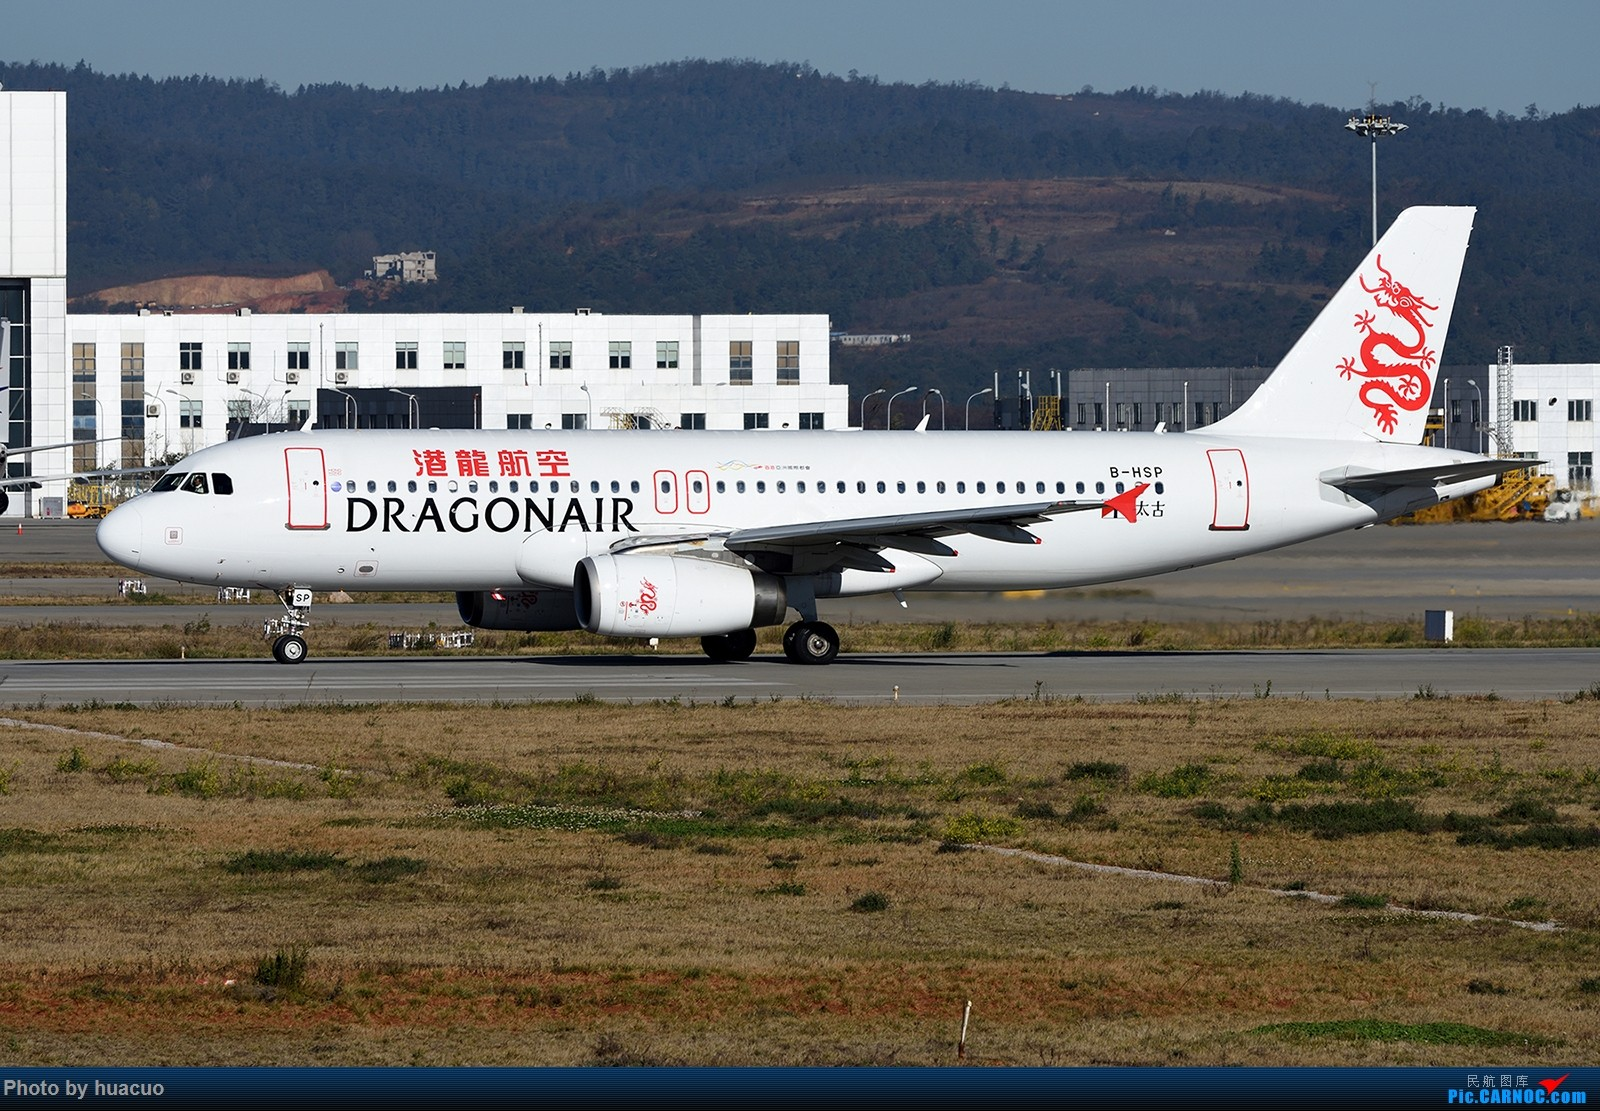 Re:[原创]【KMG】2017年首拍,天气板扎,空气通透、通透、通透 AIRBUS A320-200 B-HSP 中国昆明长水国际机场